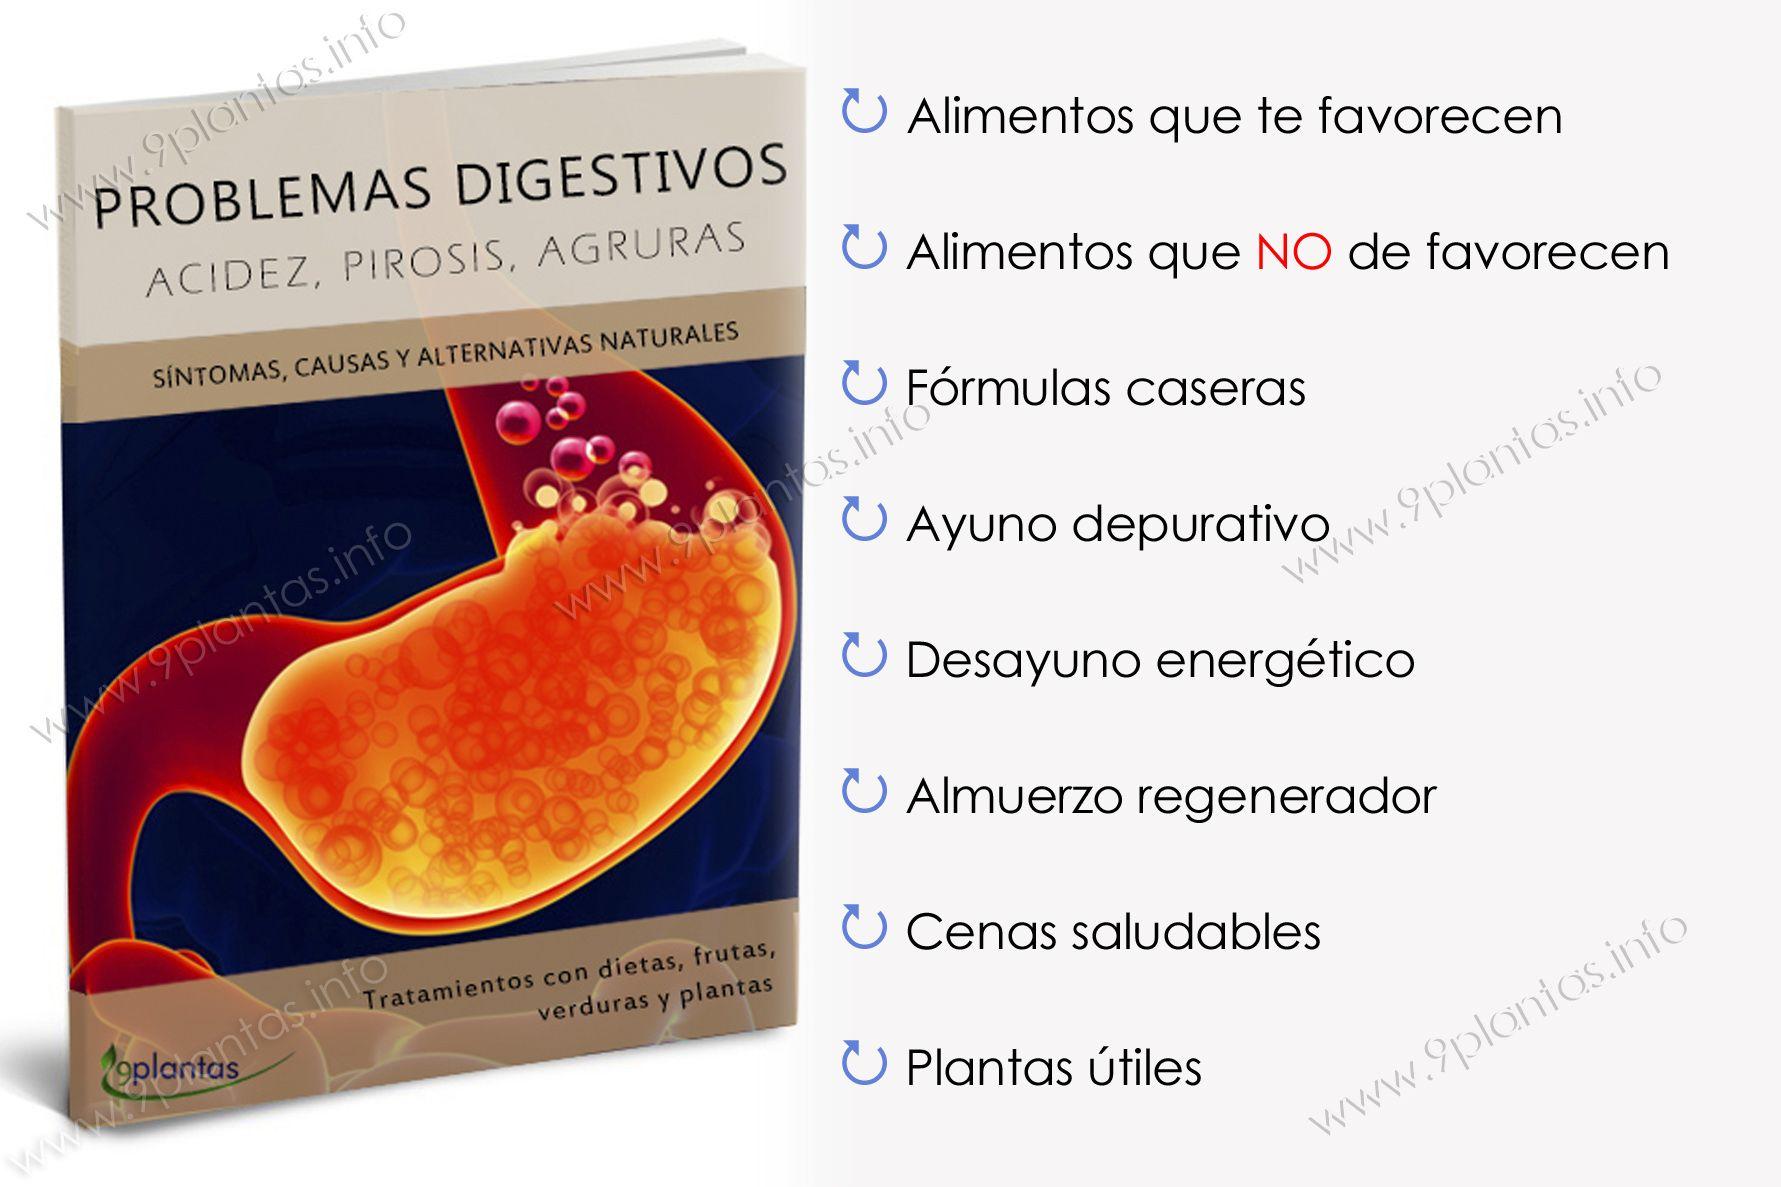 E-book | Acidez, pirosis, agruras, acidez del estomago